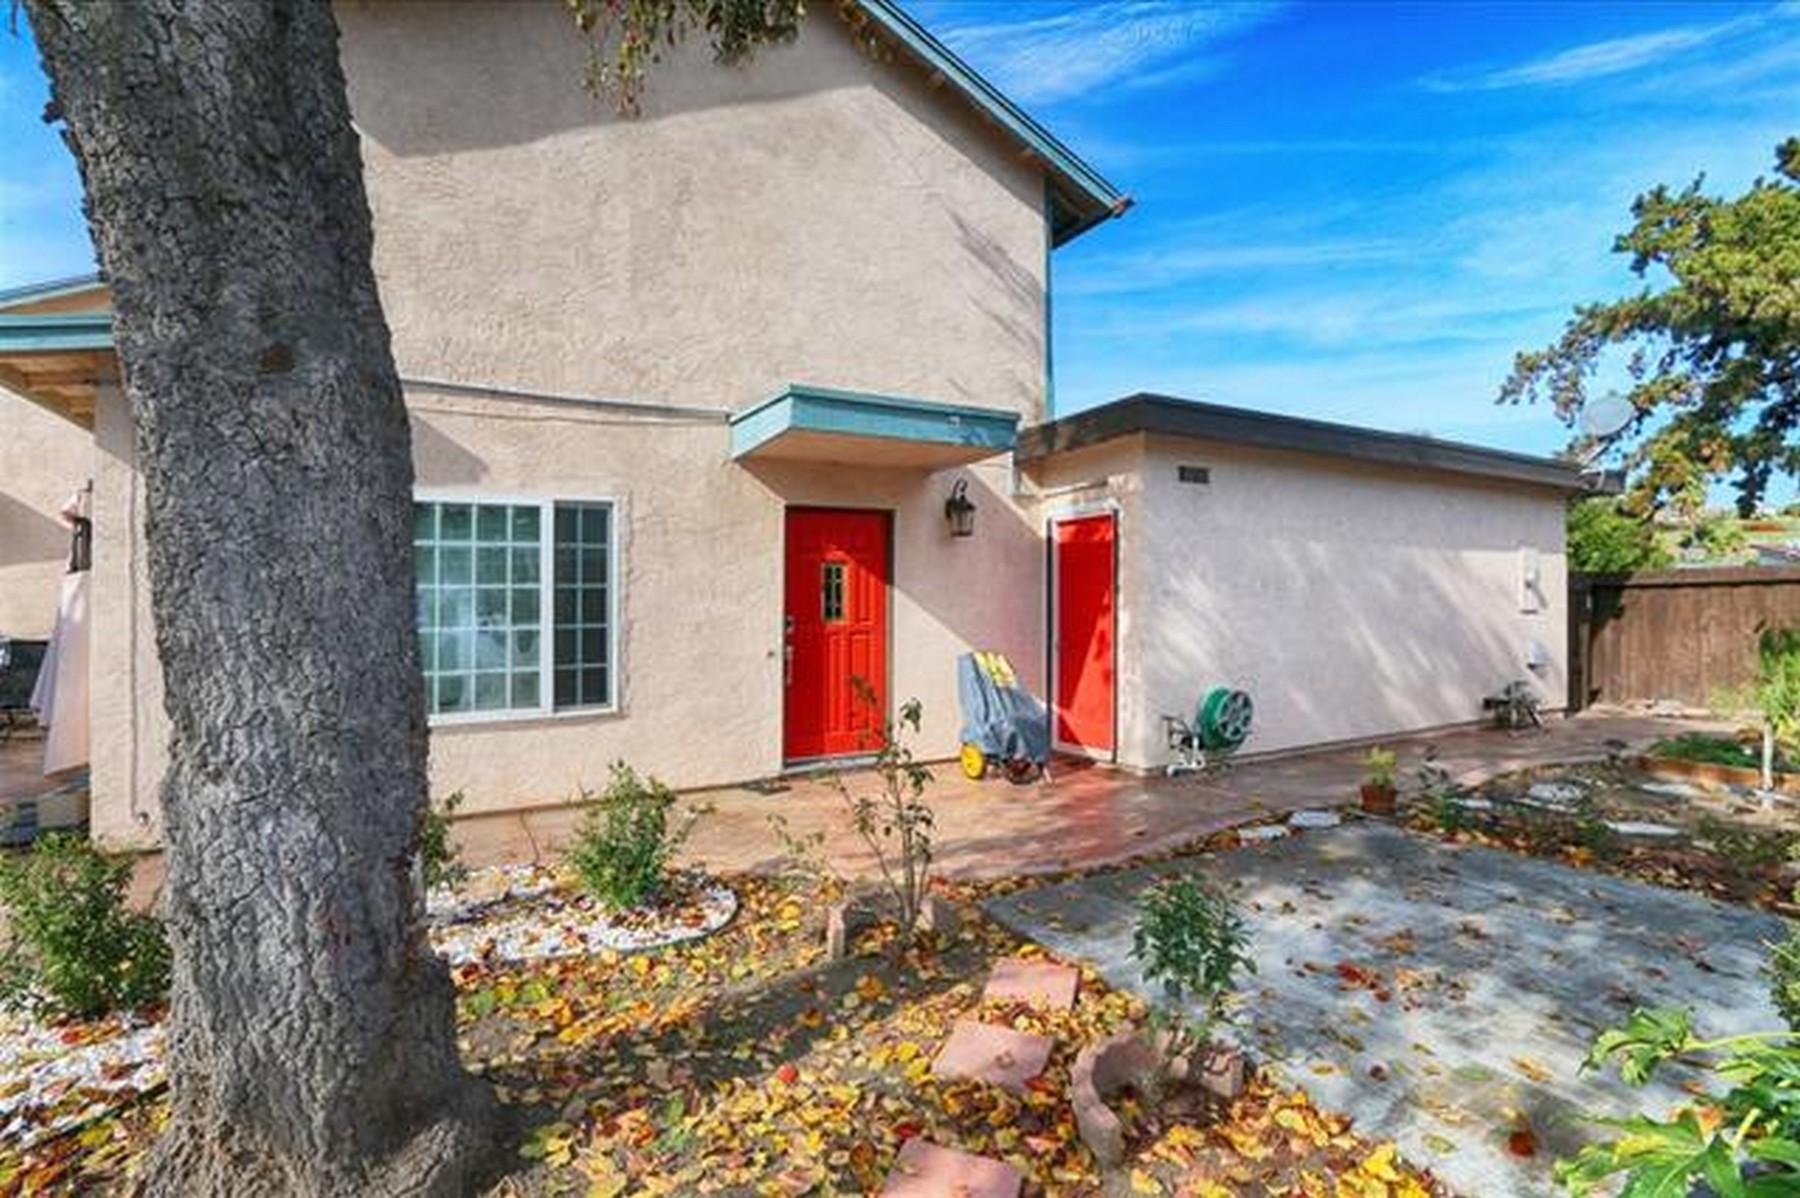 Duplex for Sale at Mesa Loma 4091 Galbar Street Oceanside, California 92056 United States